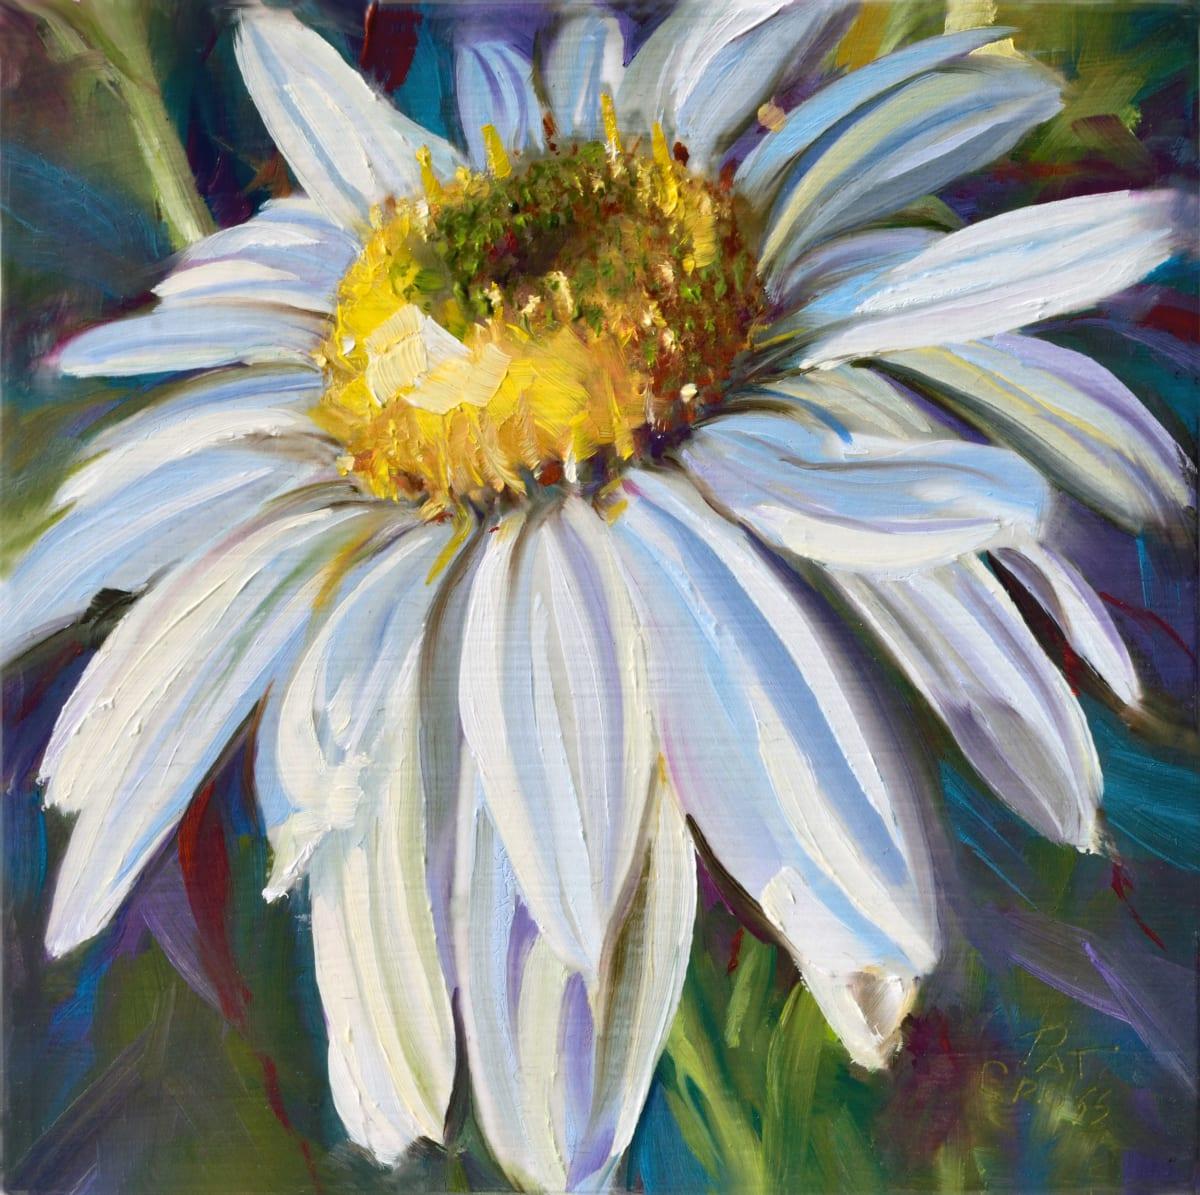 Crisp White Daisy by Pat Cross